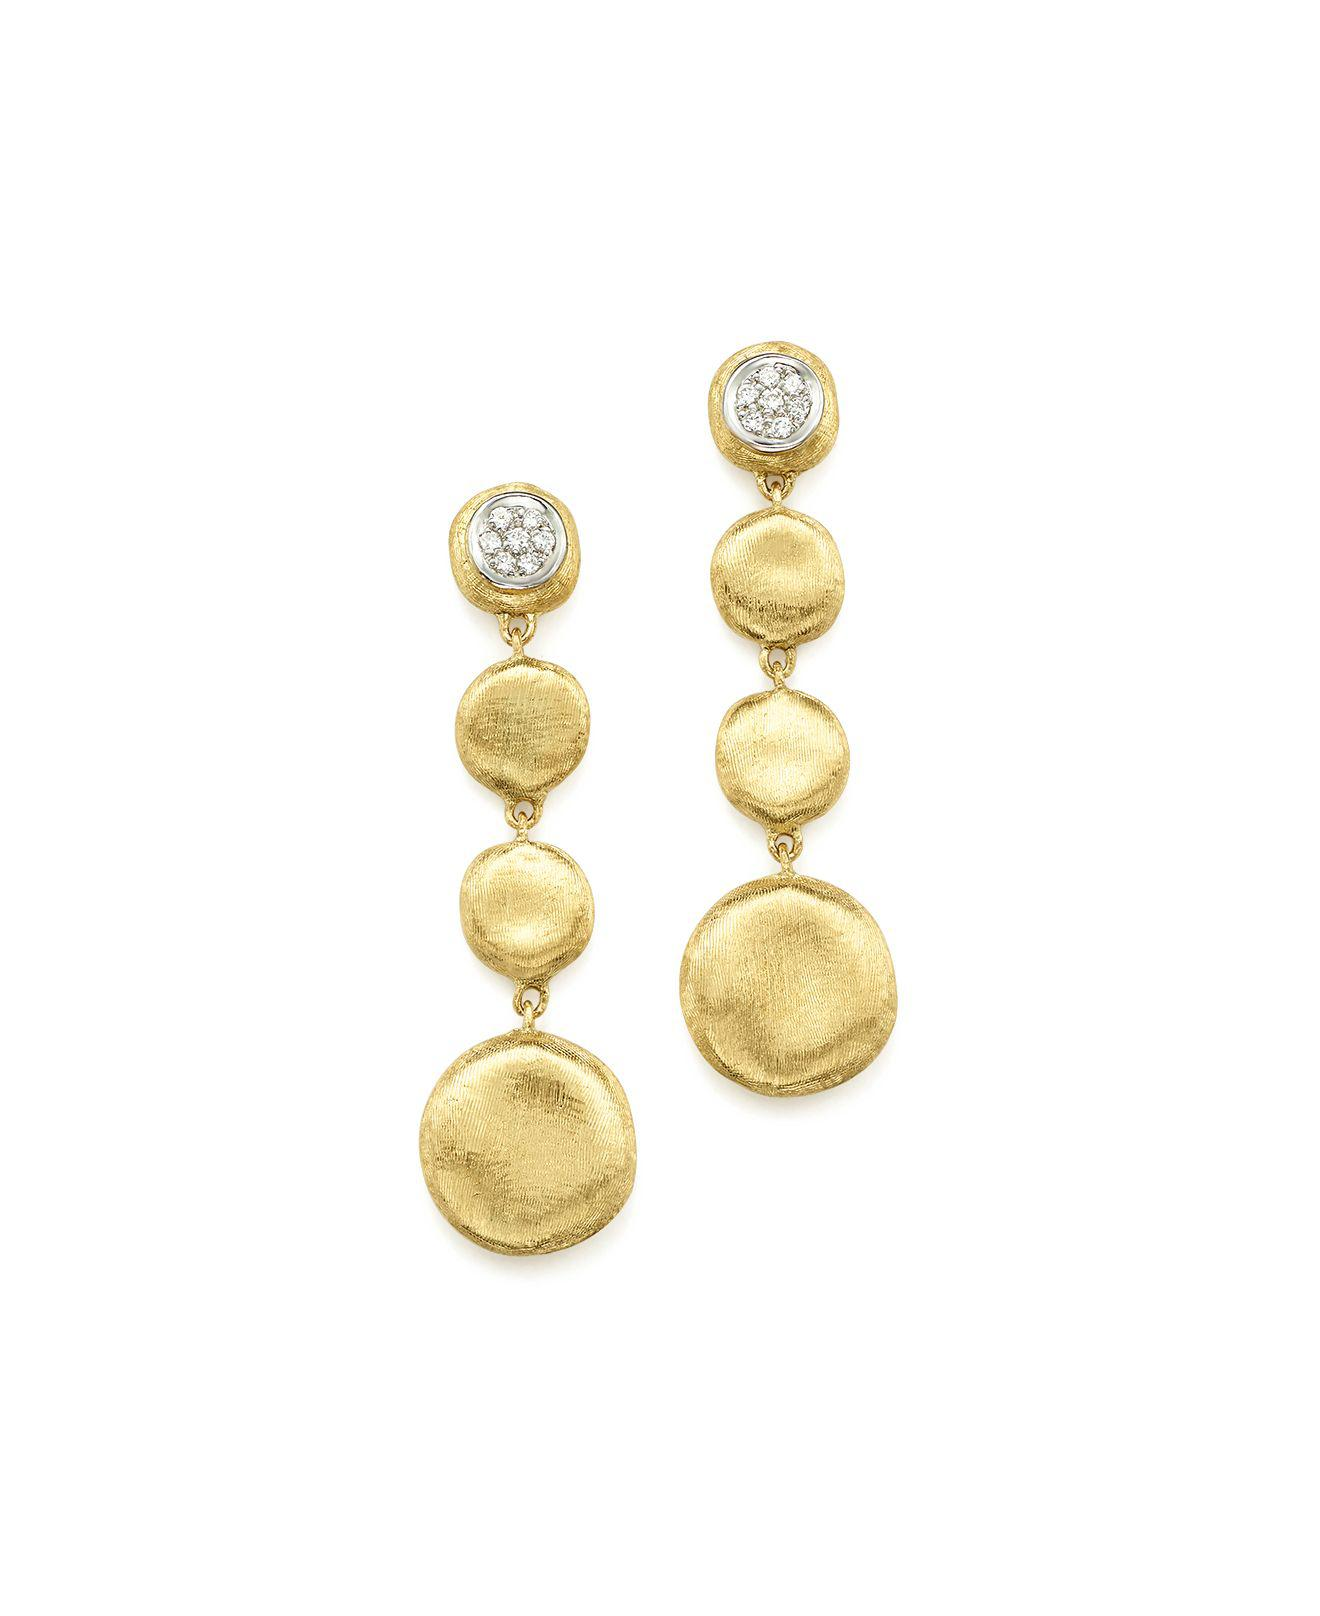 Marco Bicego Jaipur Drop Earrings with Citrine & Diamonds ei242yONG